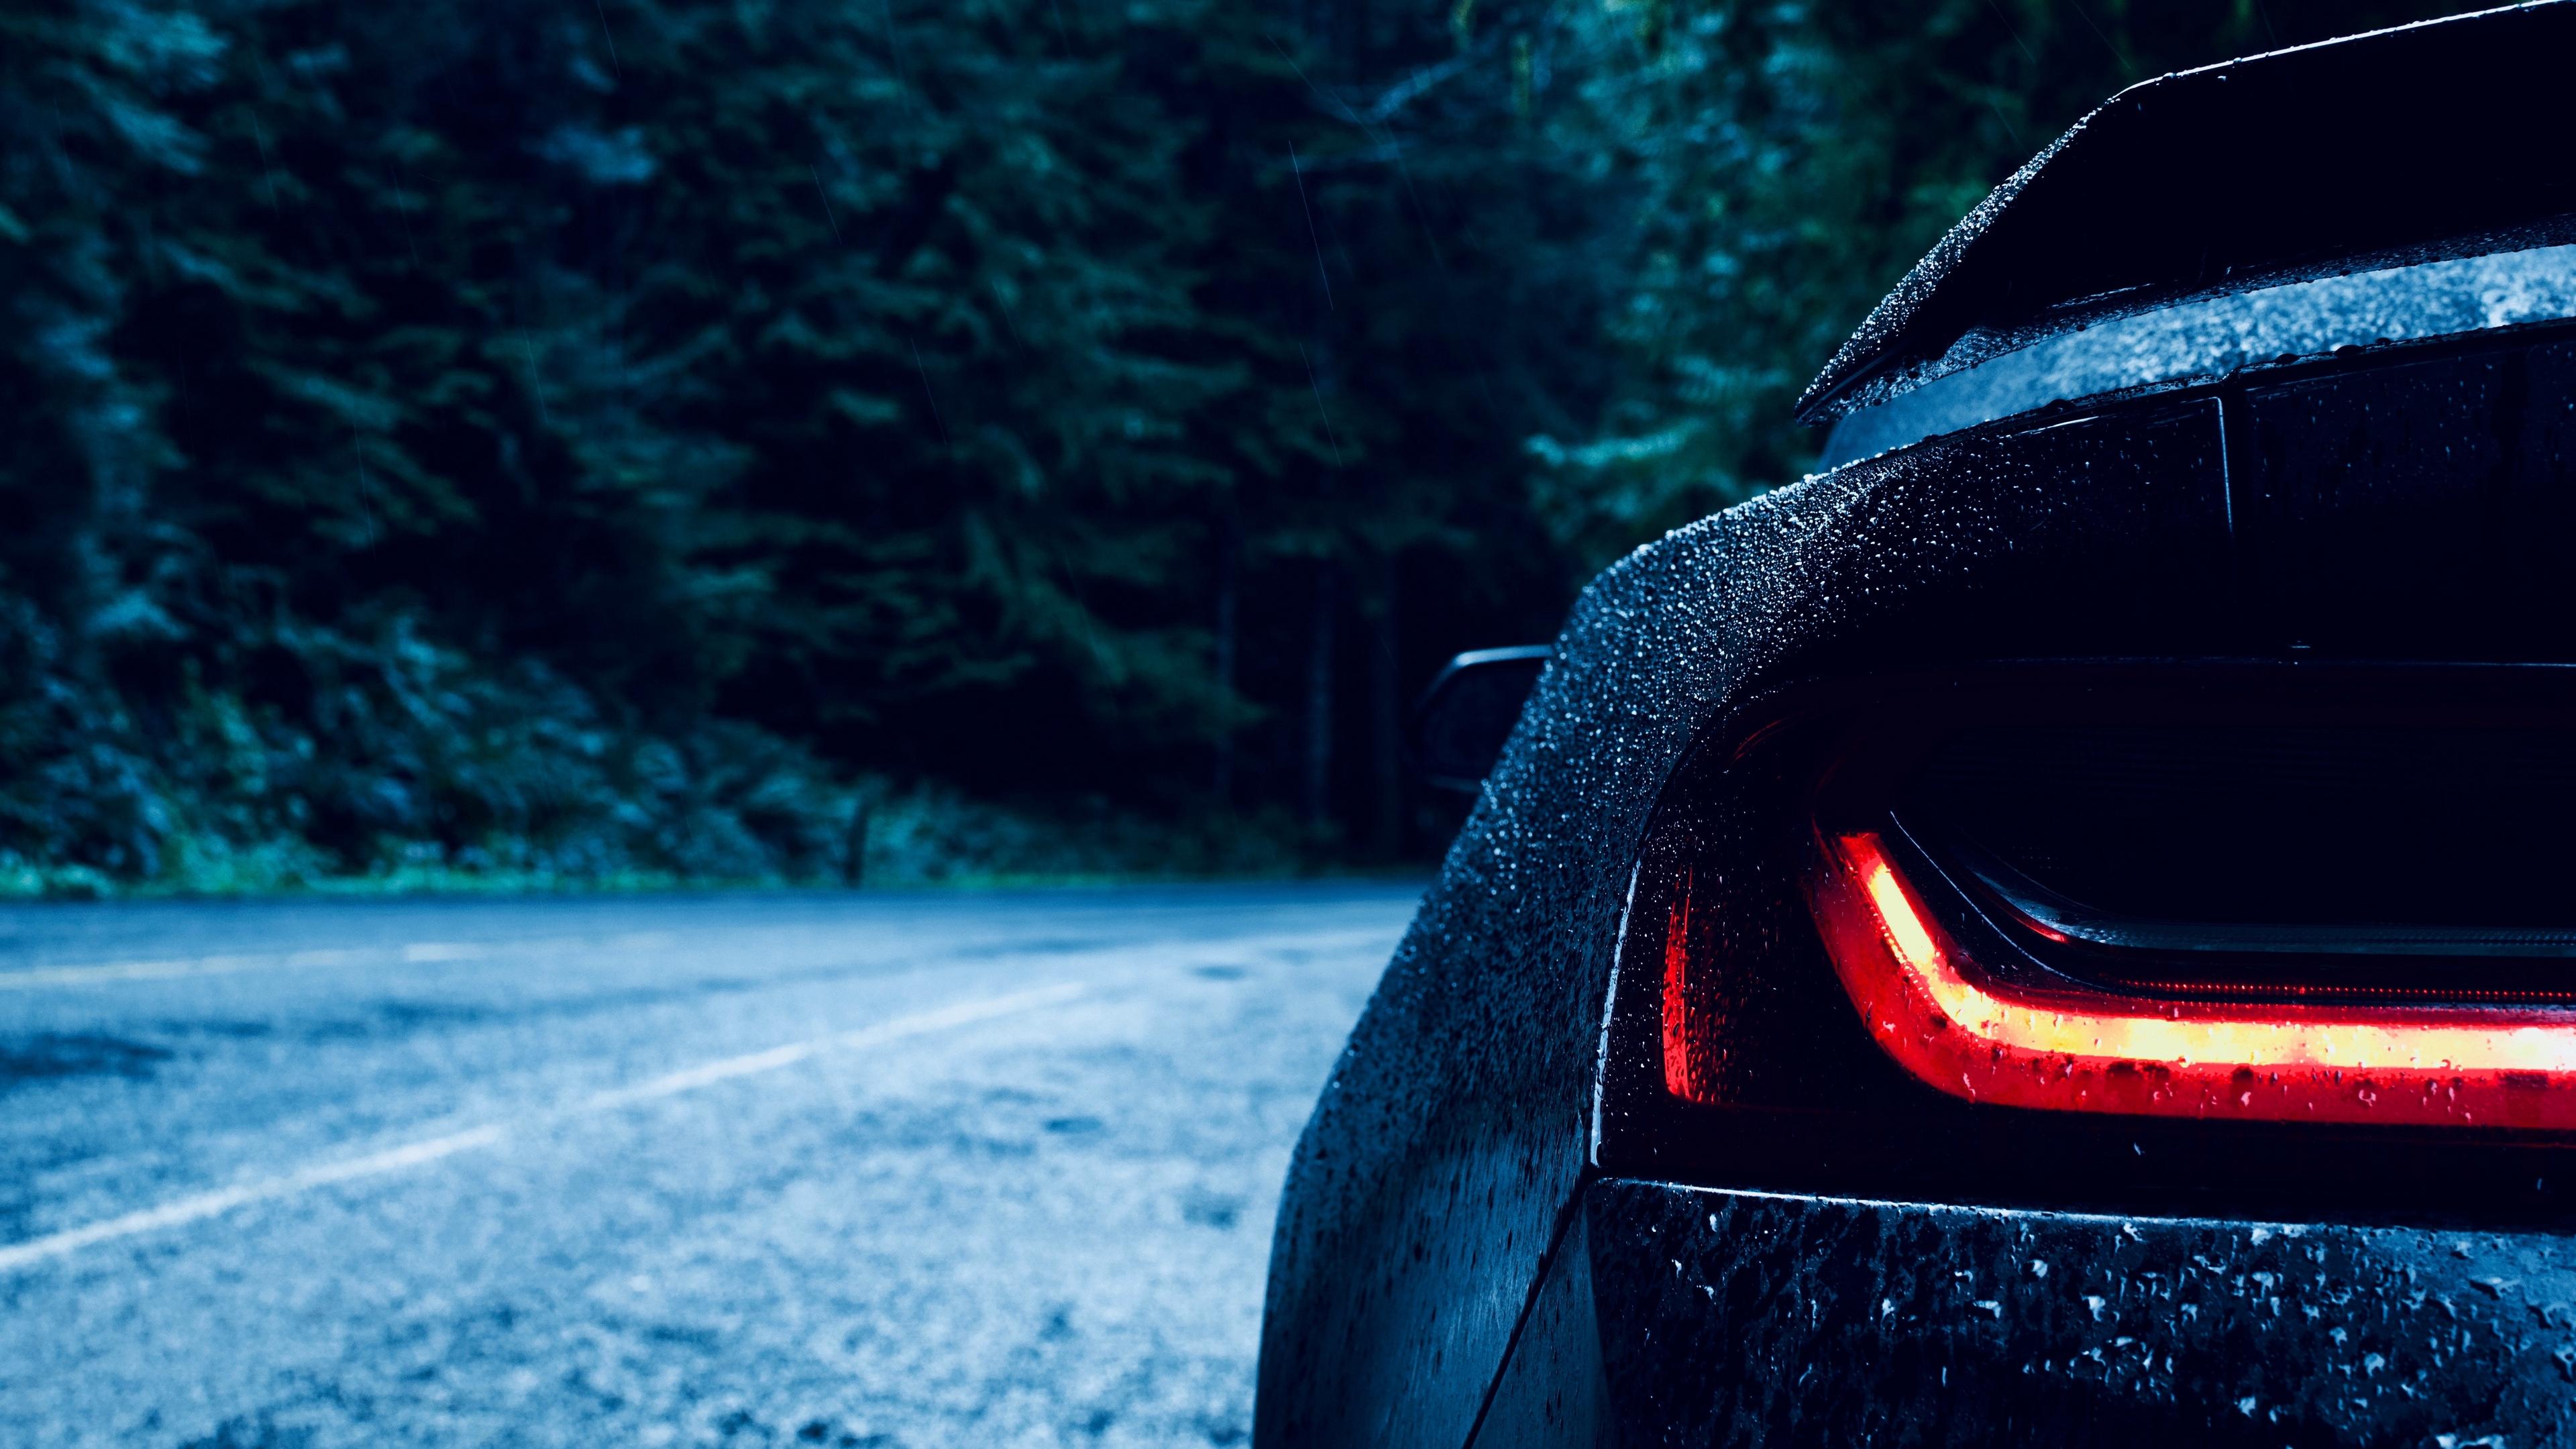 auto headlight drops blur 4k 1538935202 - auto, headlight, drops, blur 4k - headlight, Drops, auto